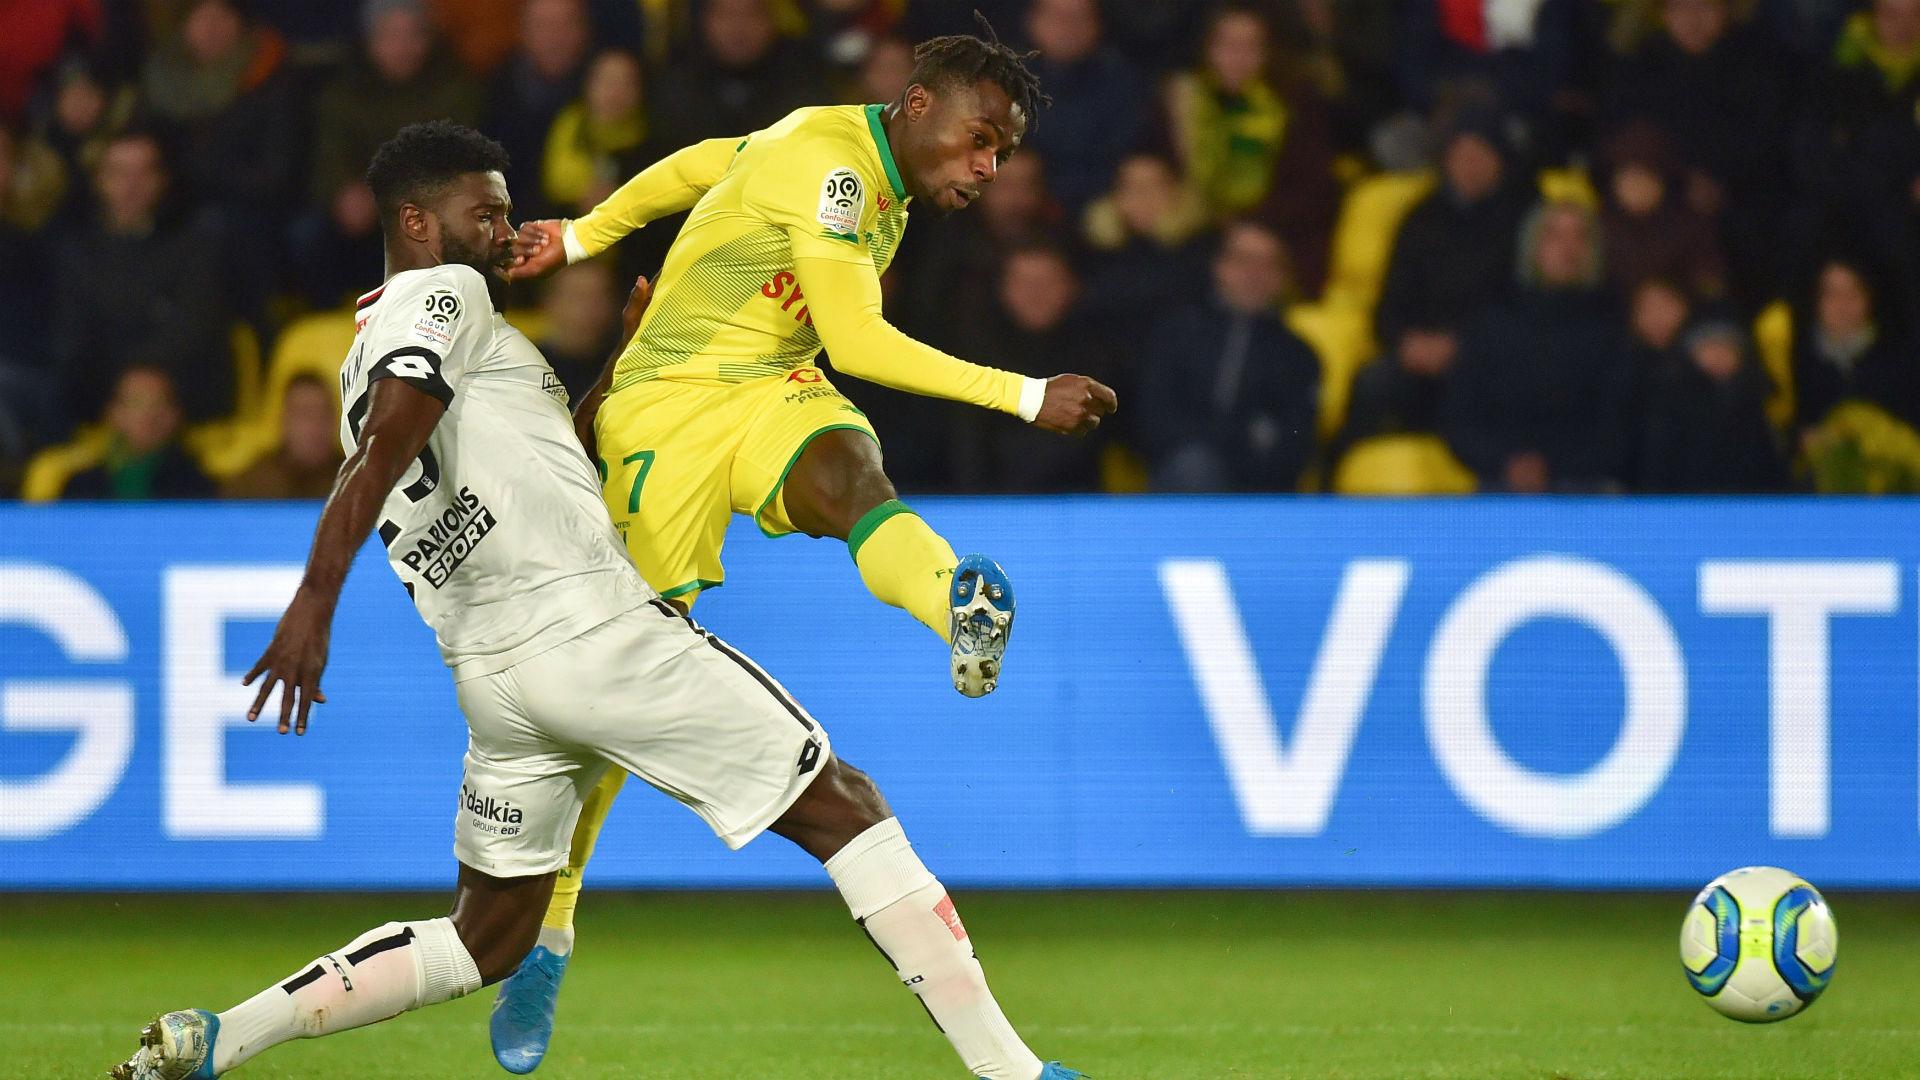 Nantes winger Moses Simon looks to Ronaldo for inspiration